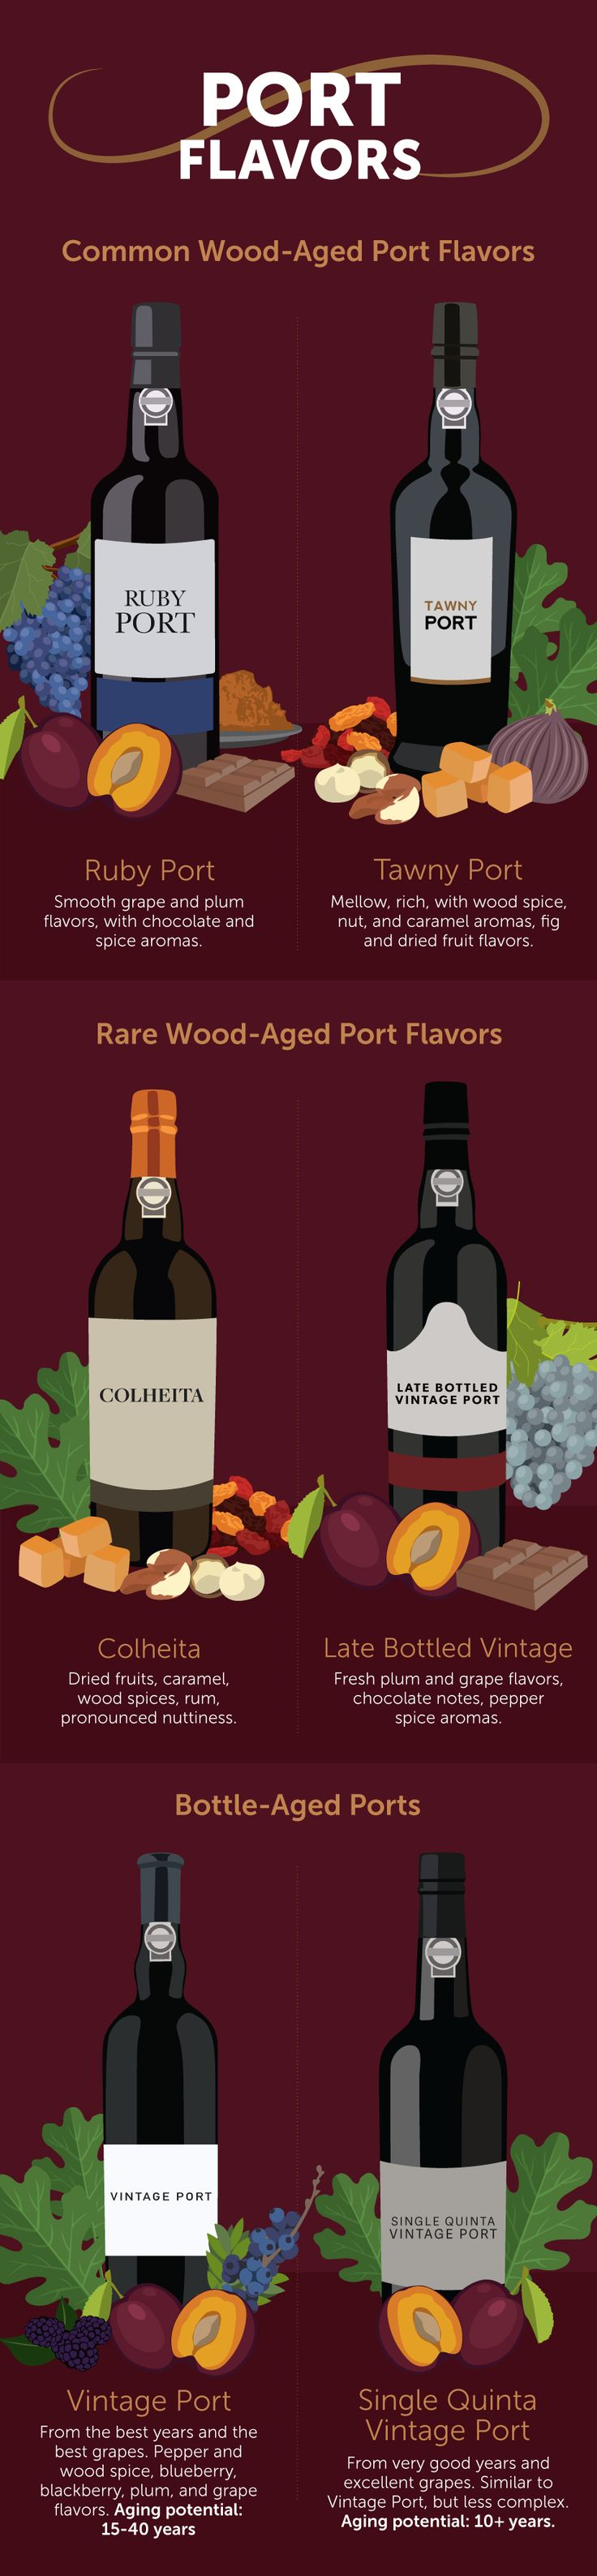 Port Flavors - A Port Wine Primer